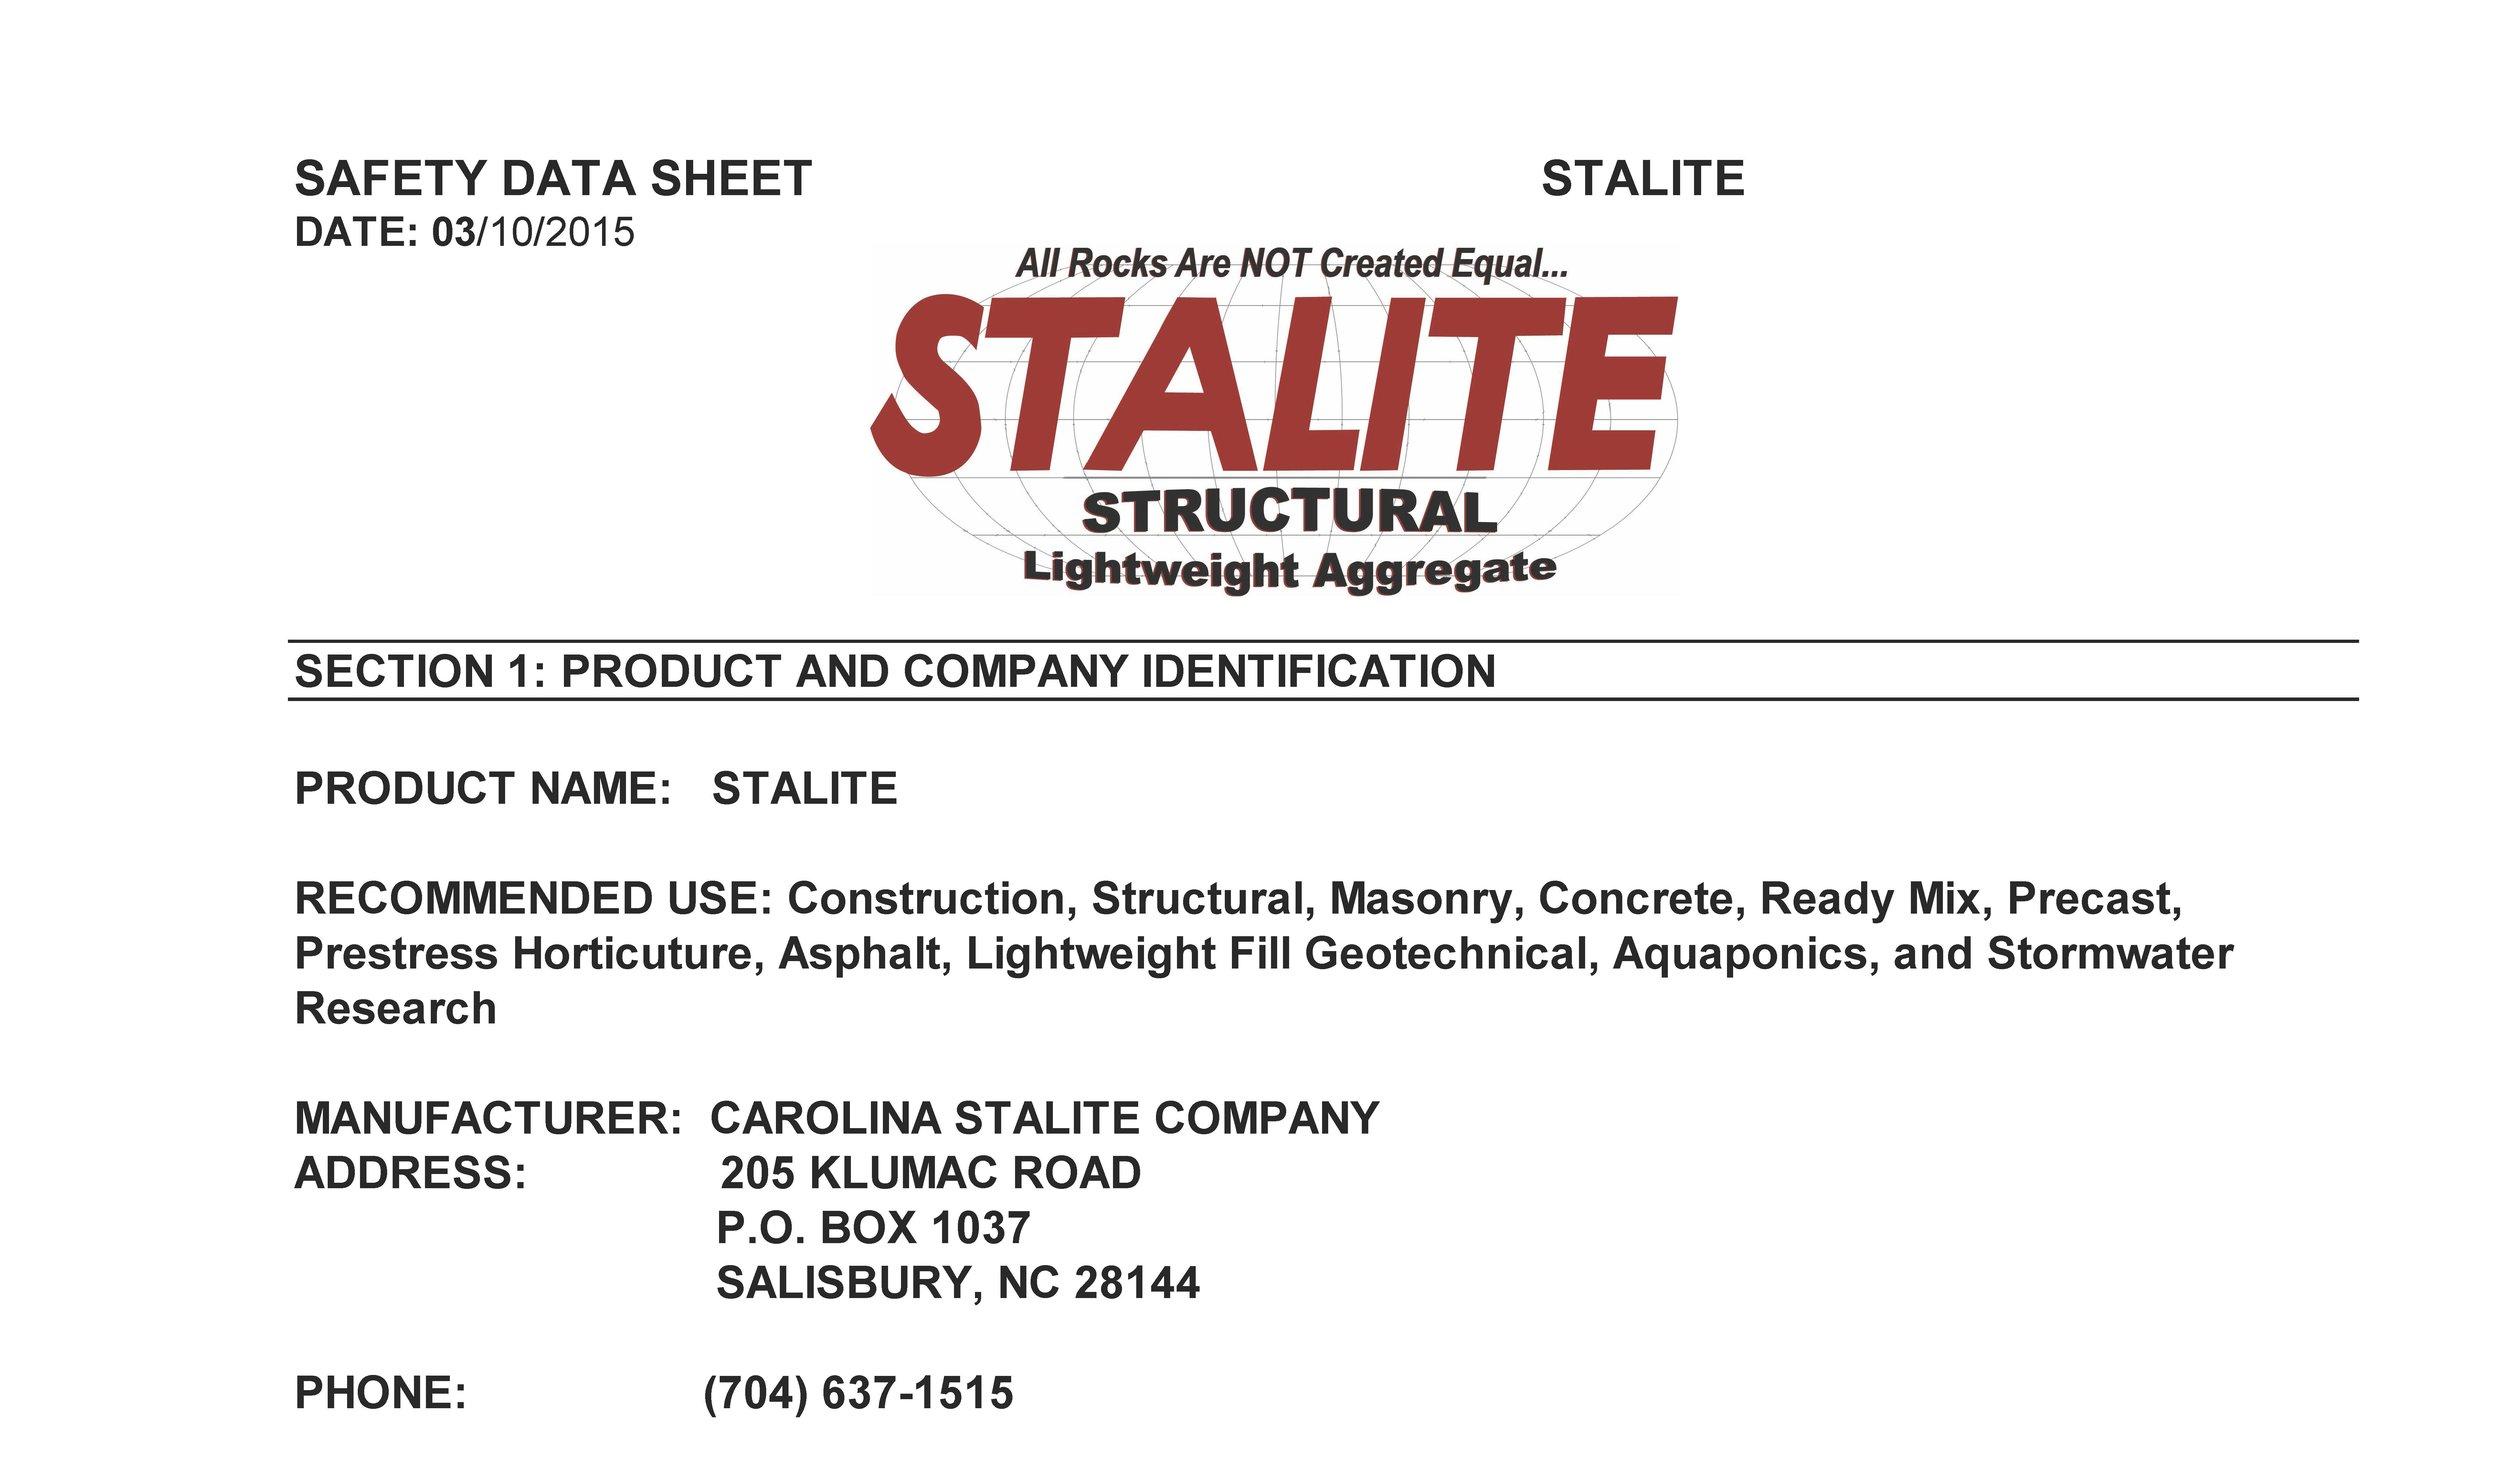 Stalite SDS (New MSDS) Form-JPEG-COVER-WEB.jpg